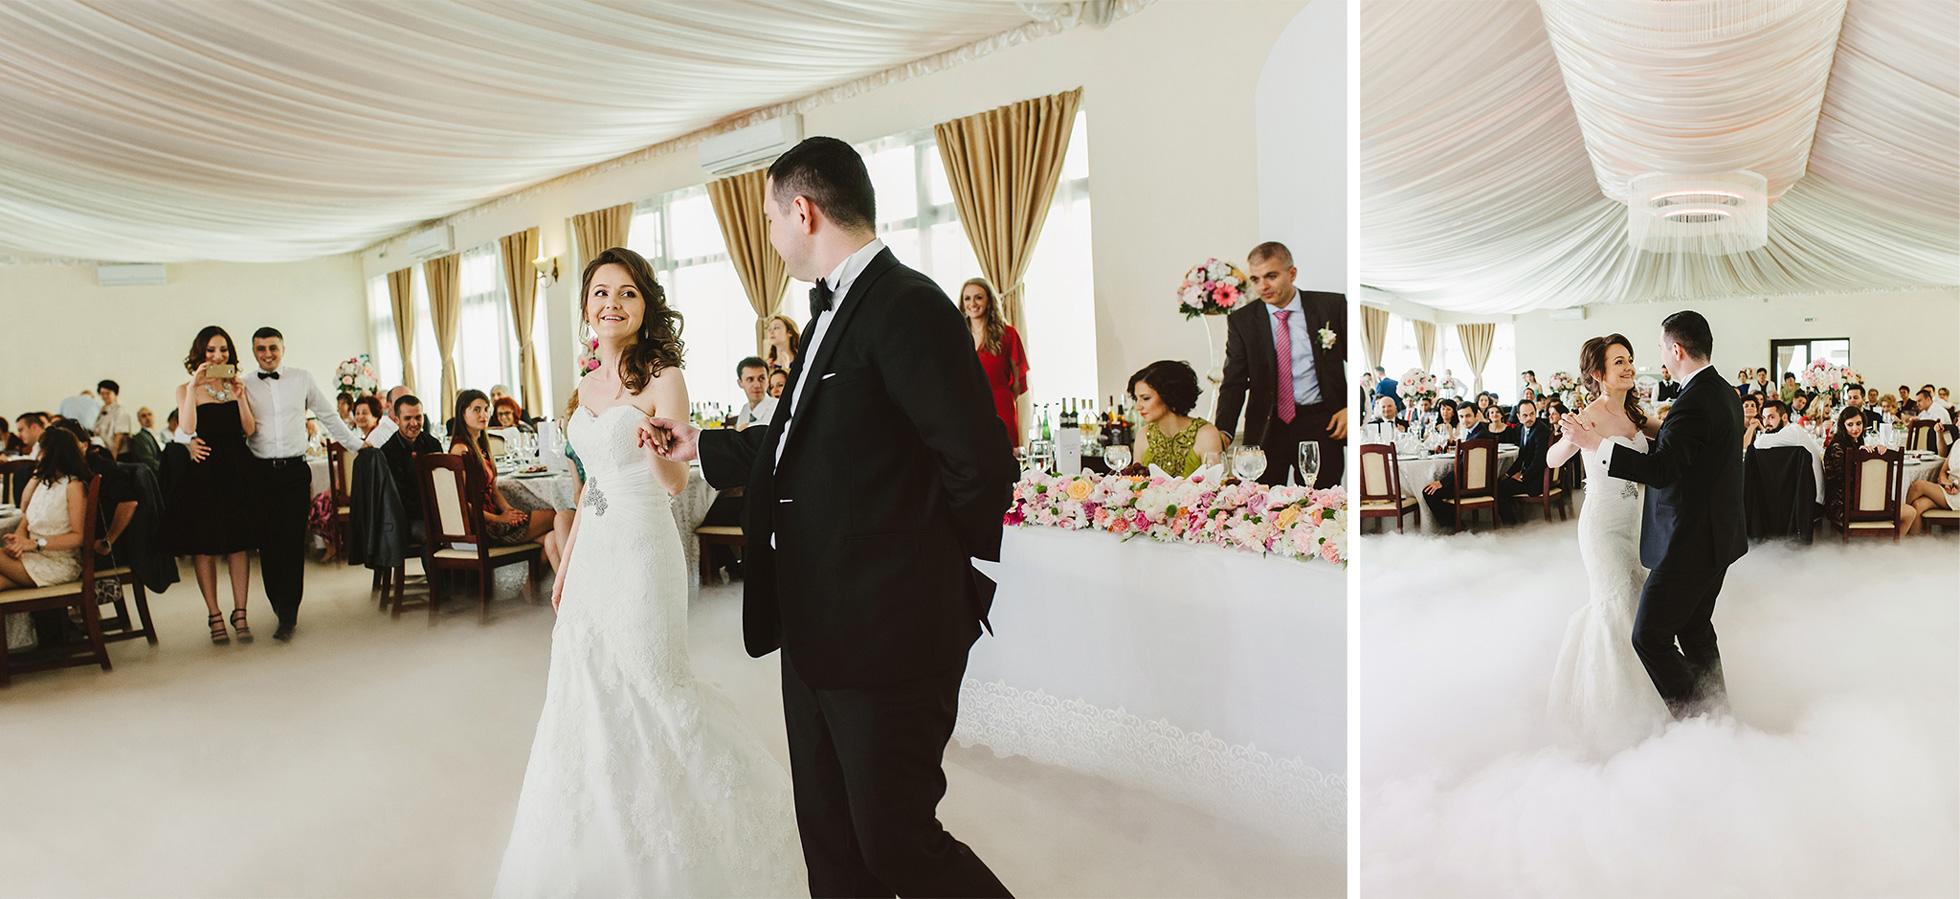 Liana-+-Florin-{wedding}-151